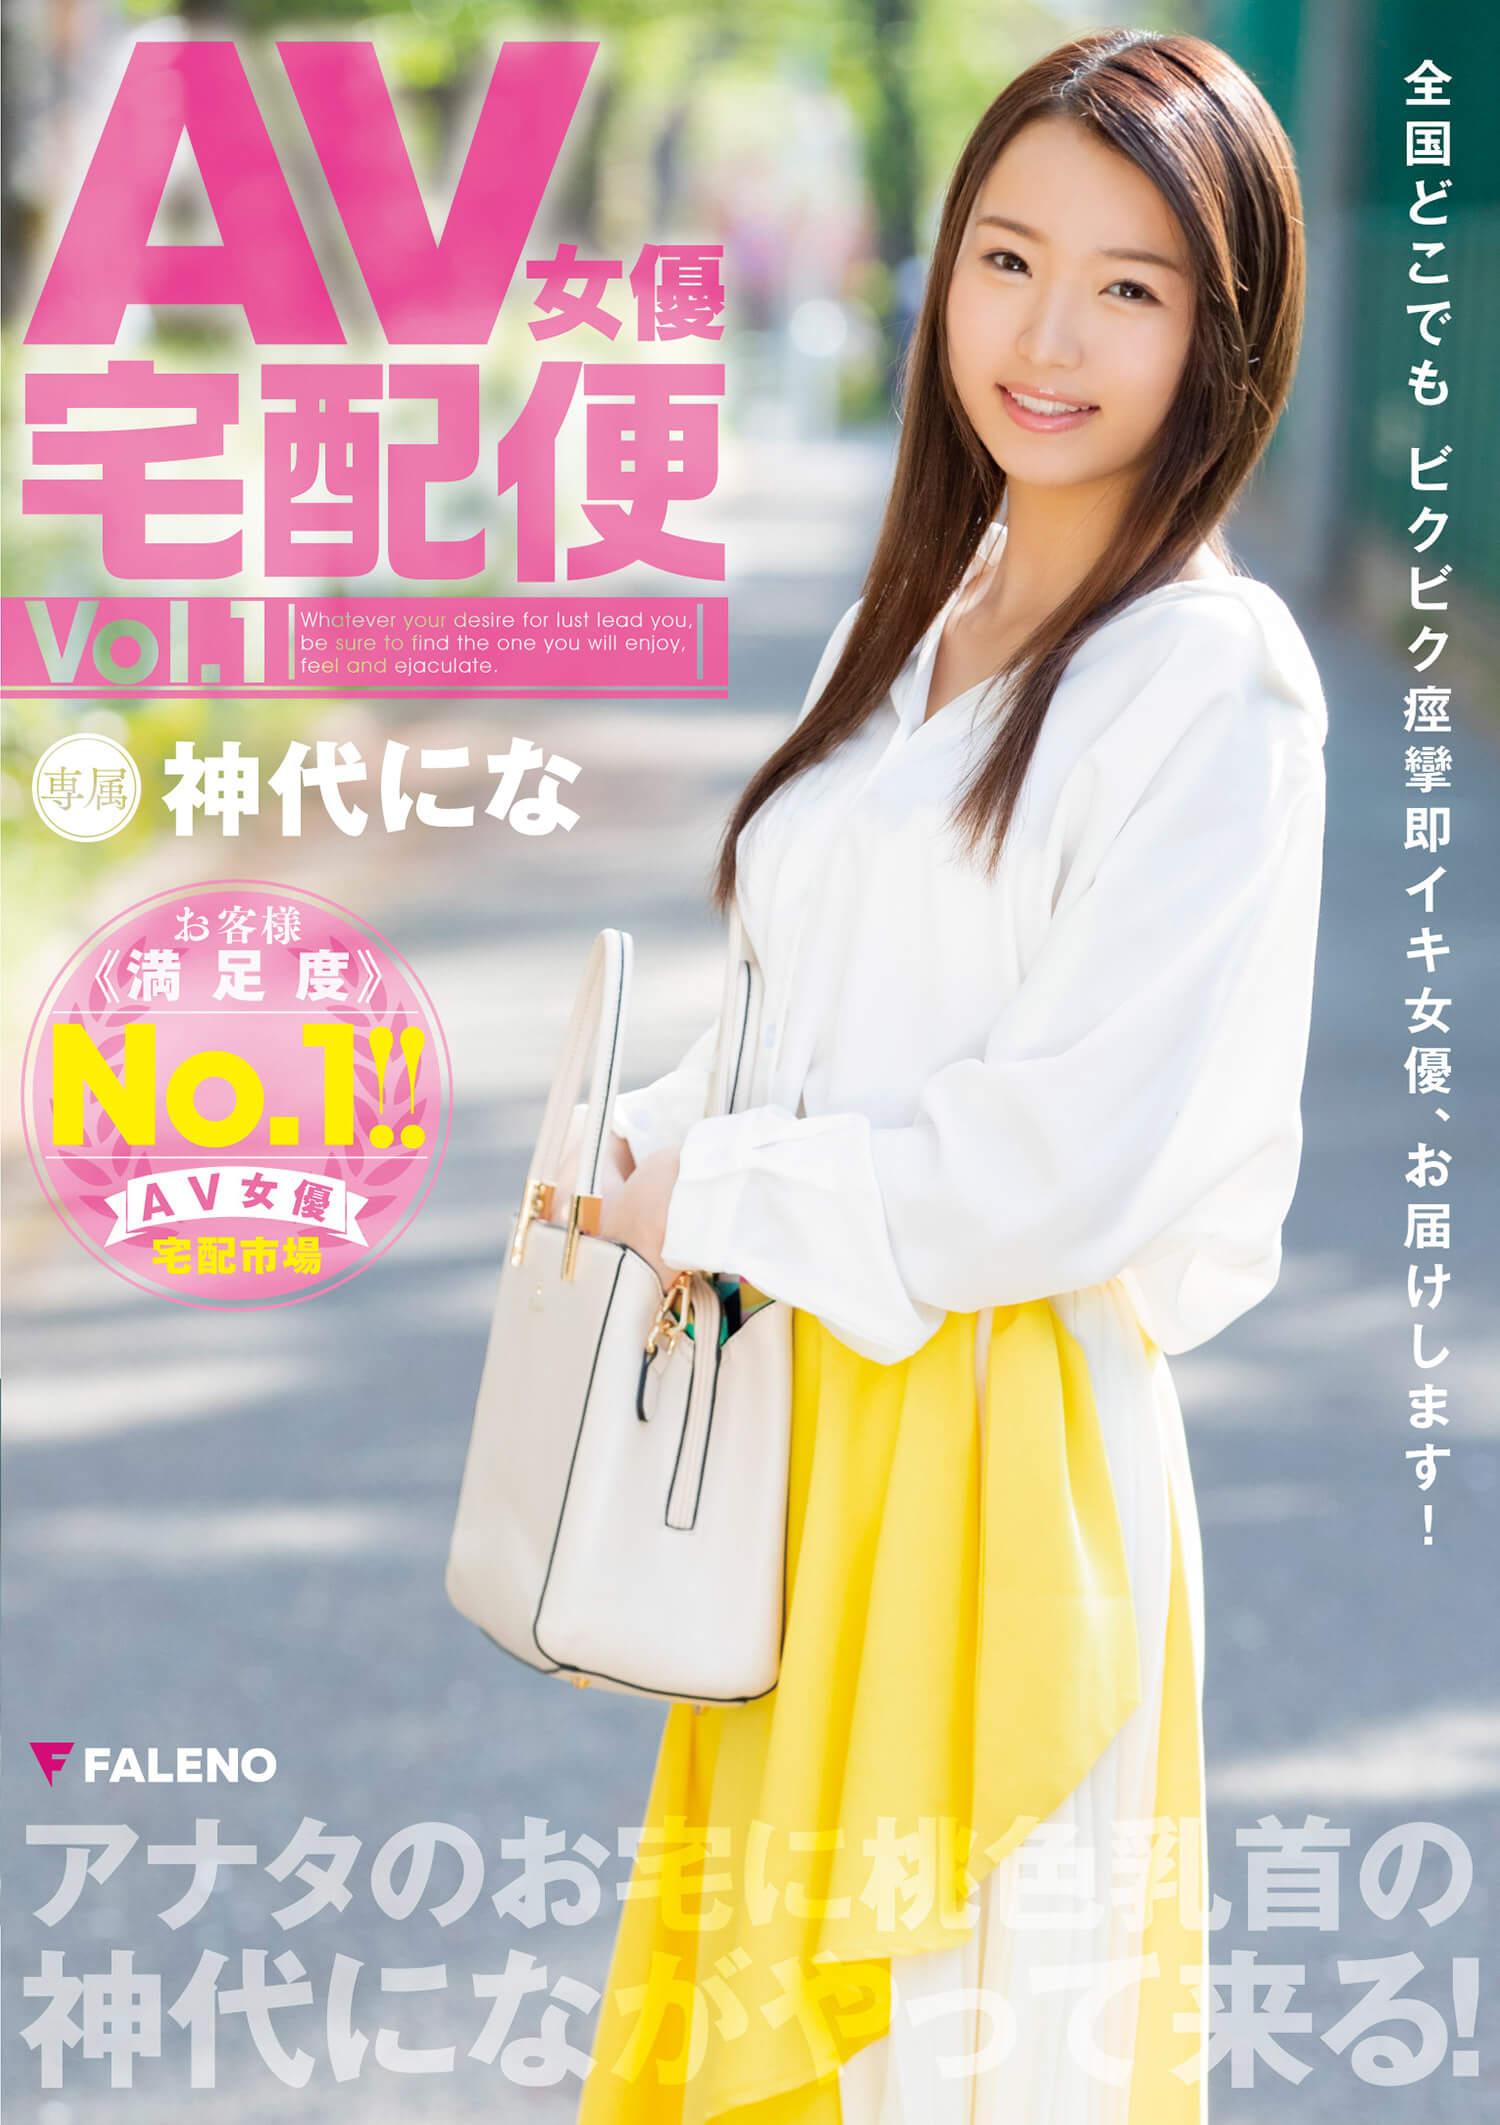 AV女優宅配便 Vol.1